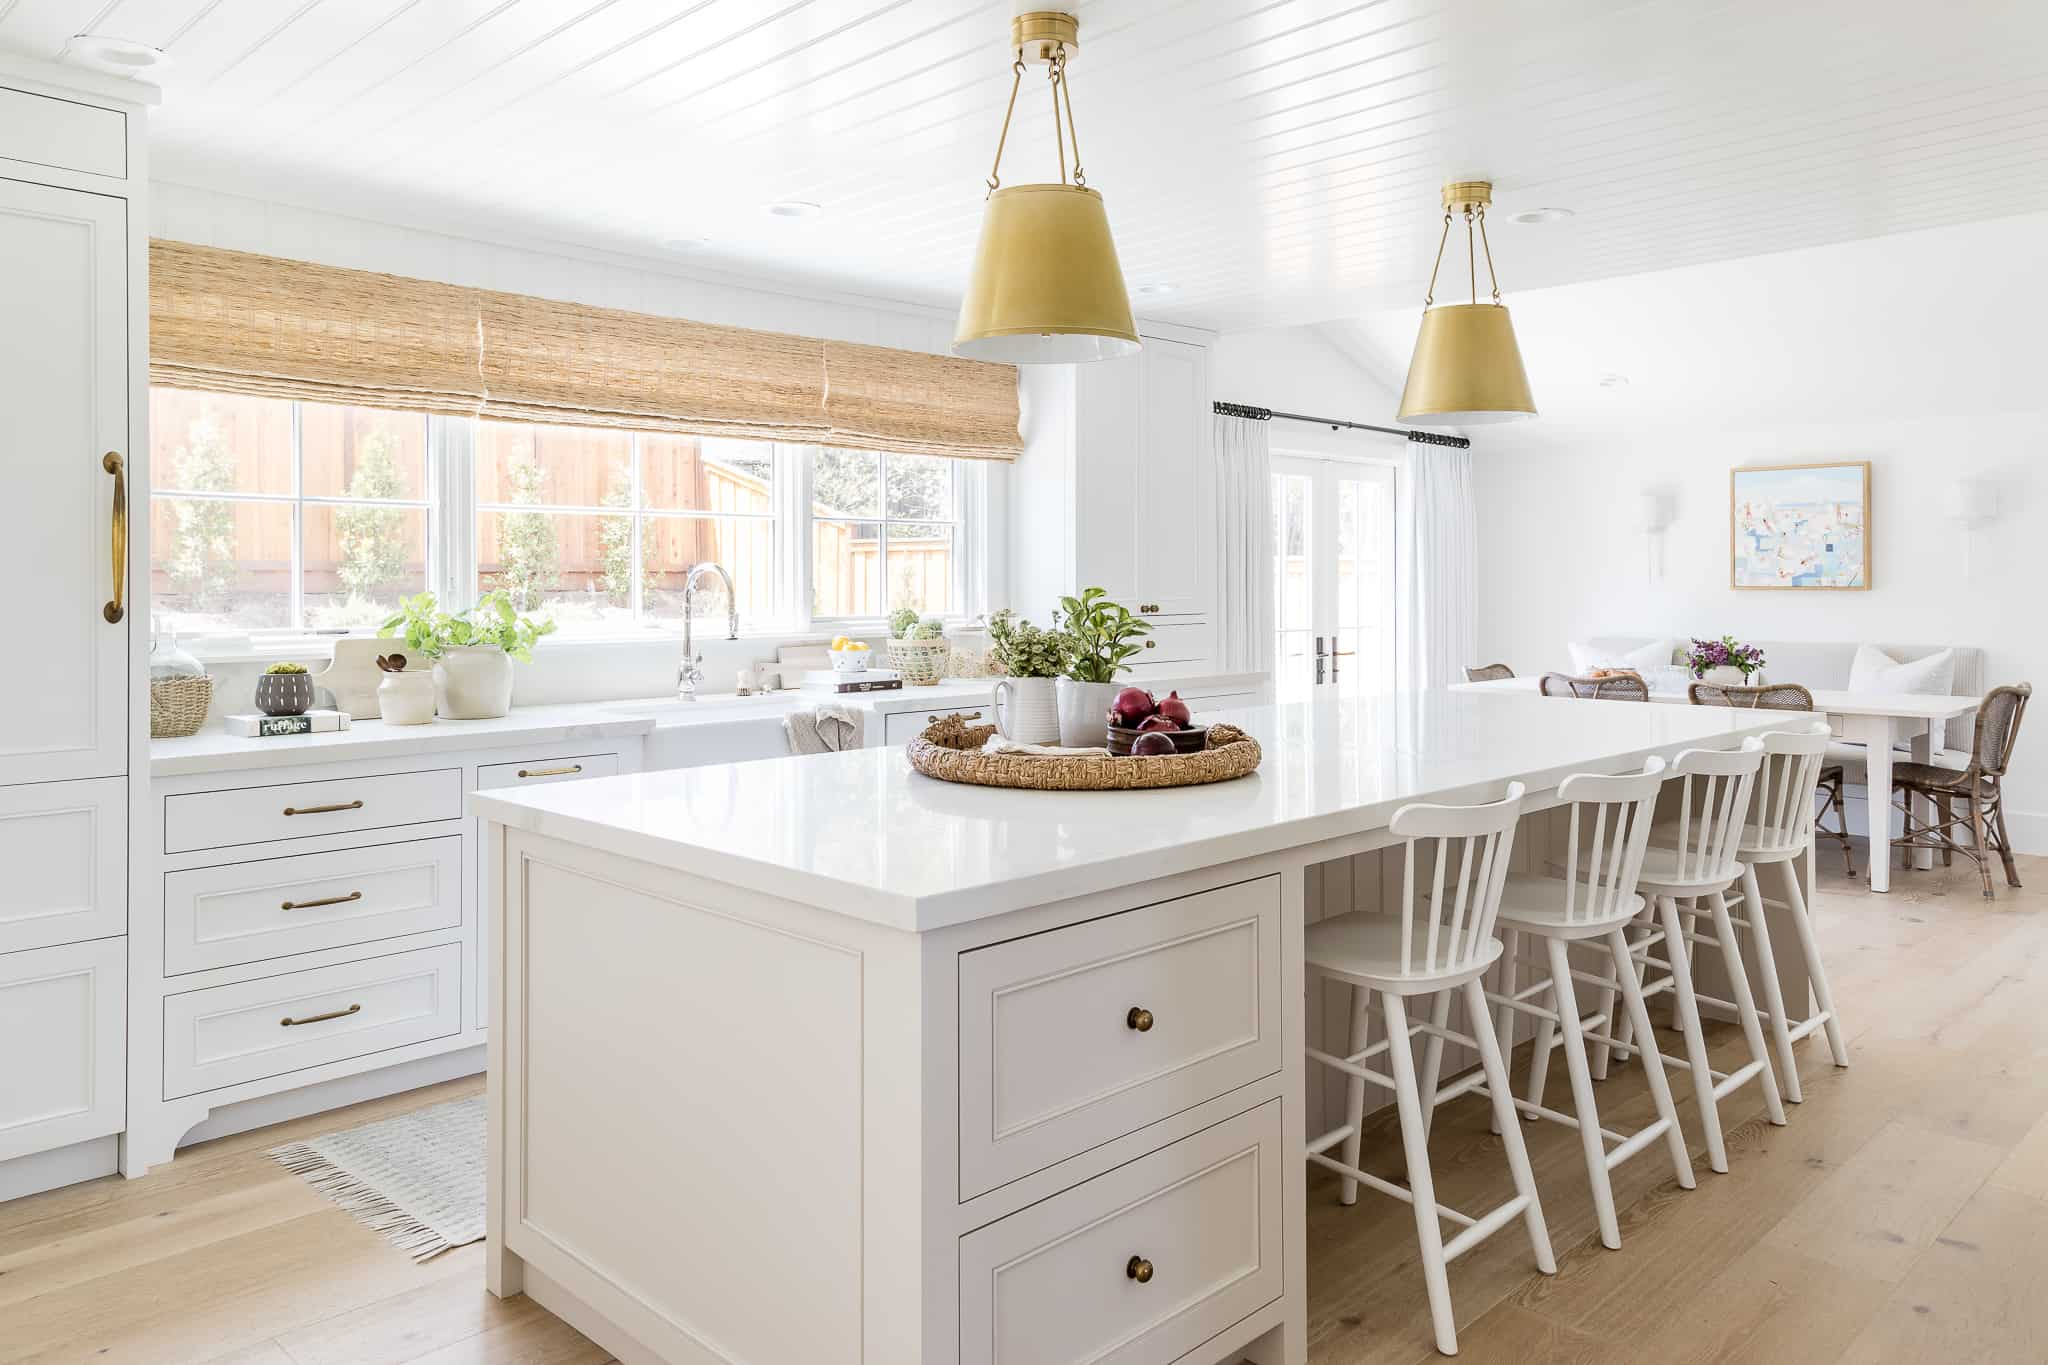 Port Newport Project - Mindy Gayer Design Co. - Kitchen Island Design